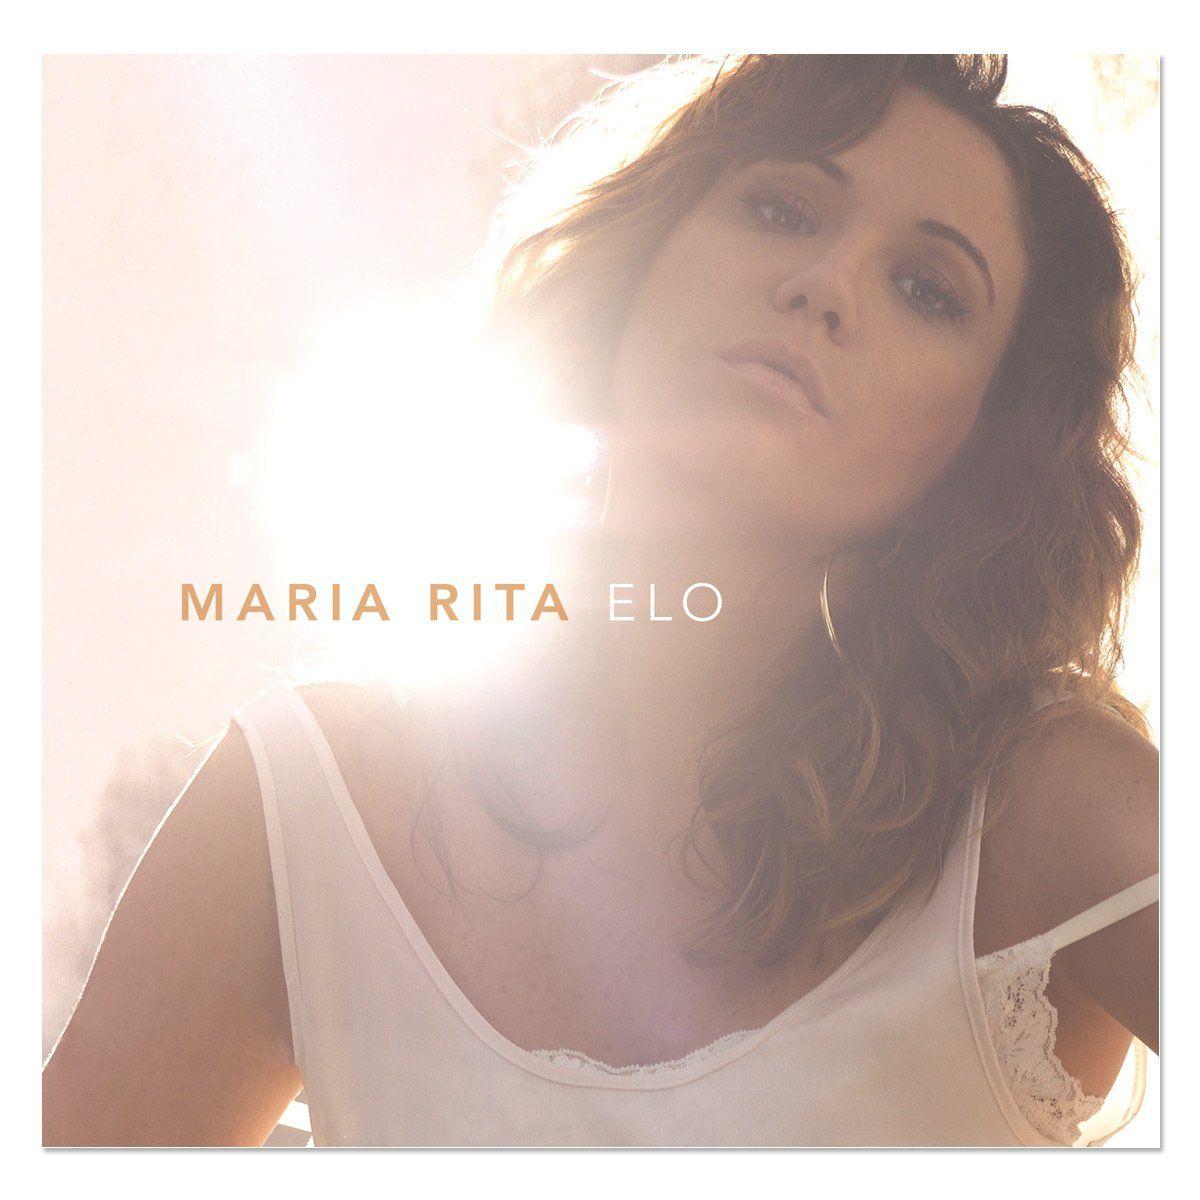 LP Maria Rita Elo  - bandUP Store Marketplace